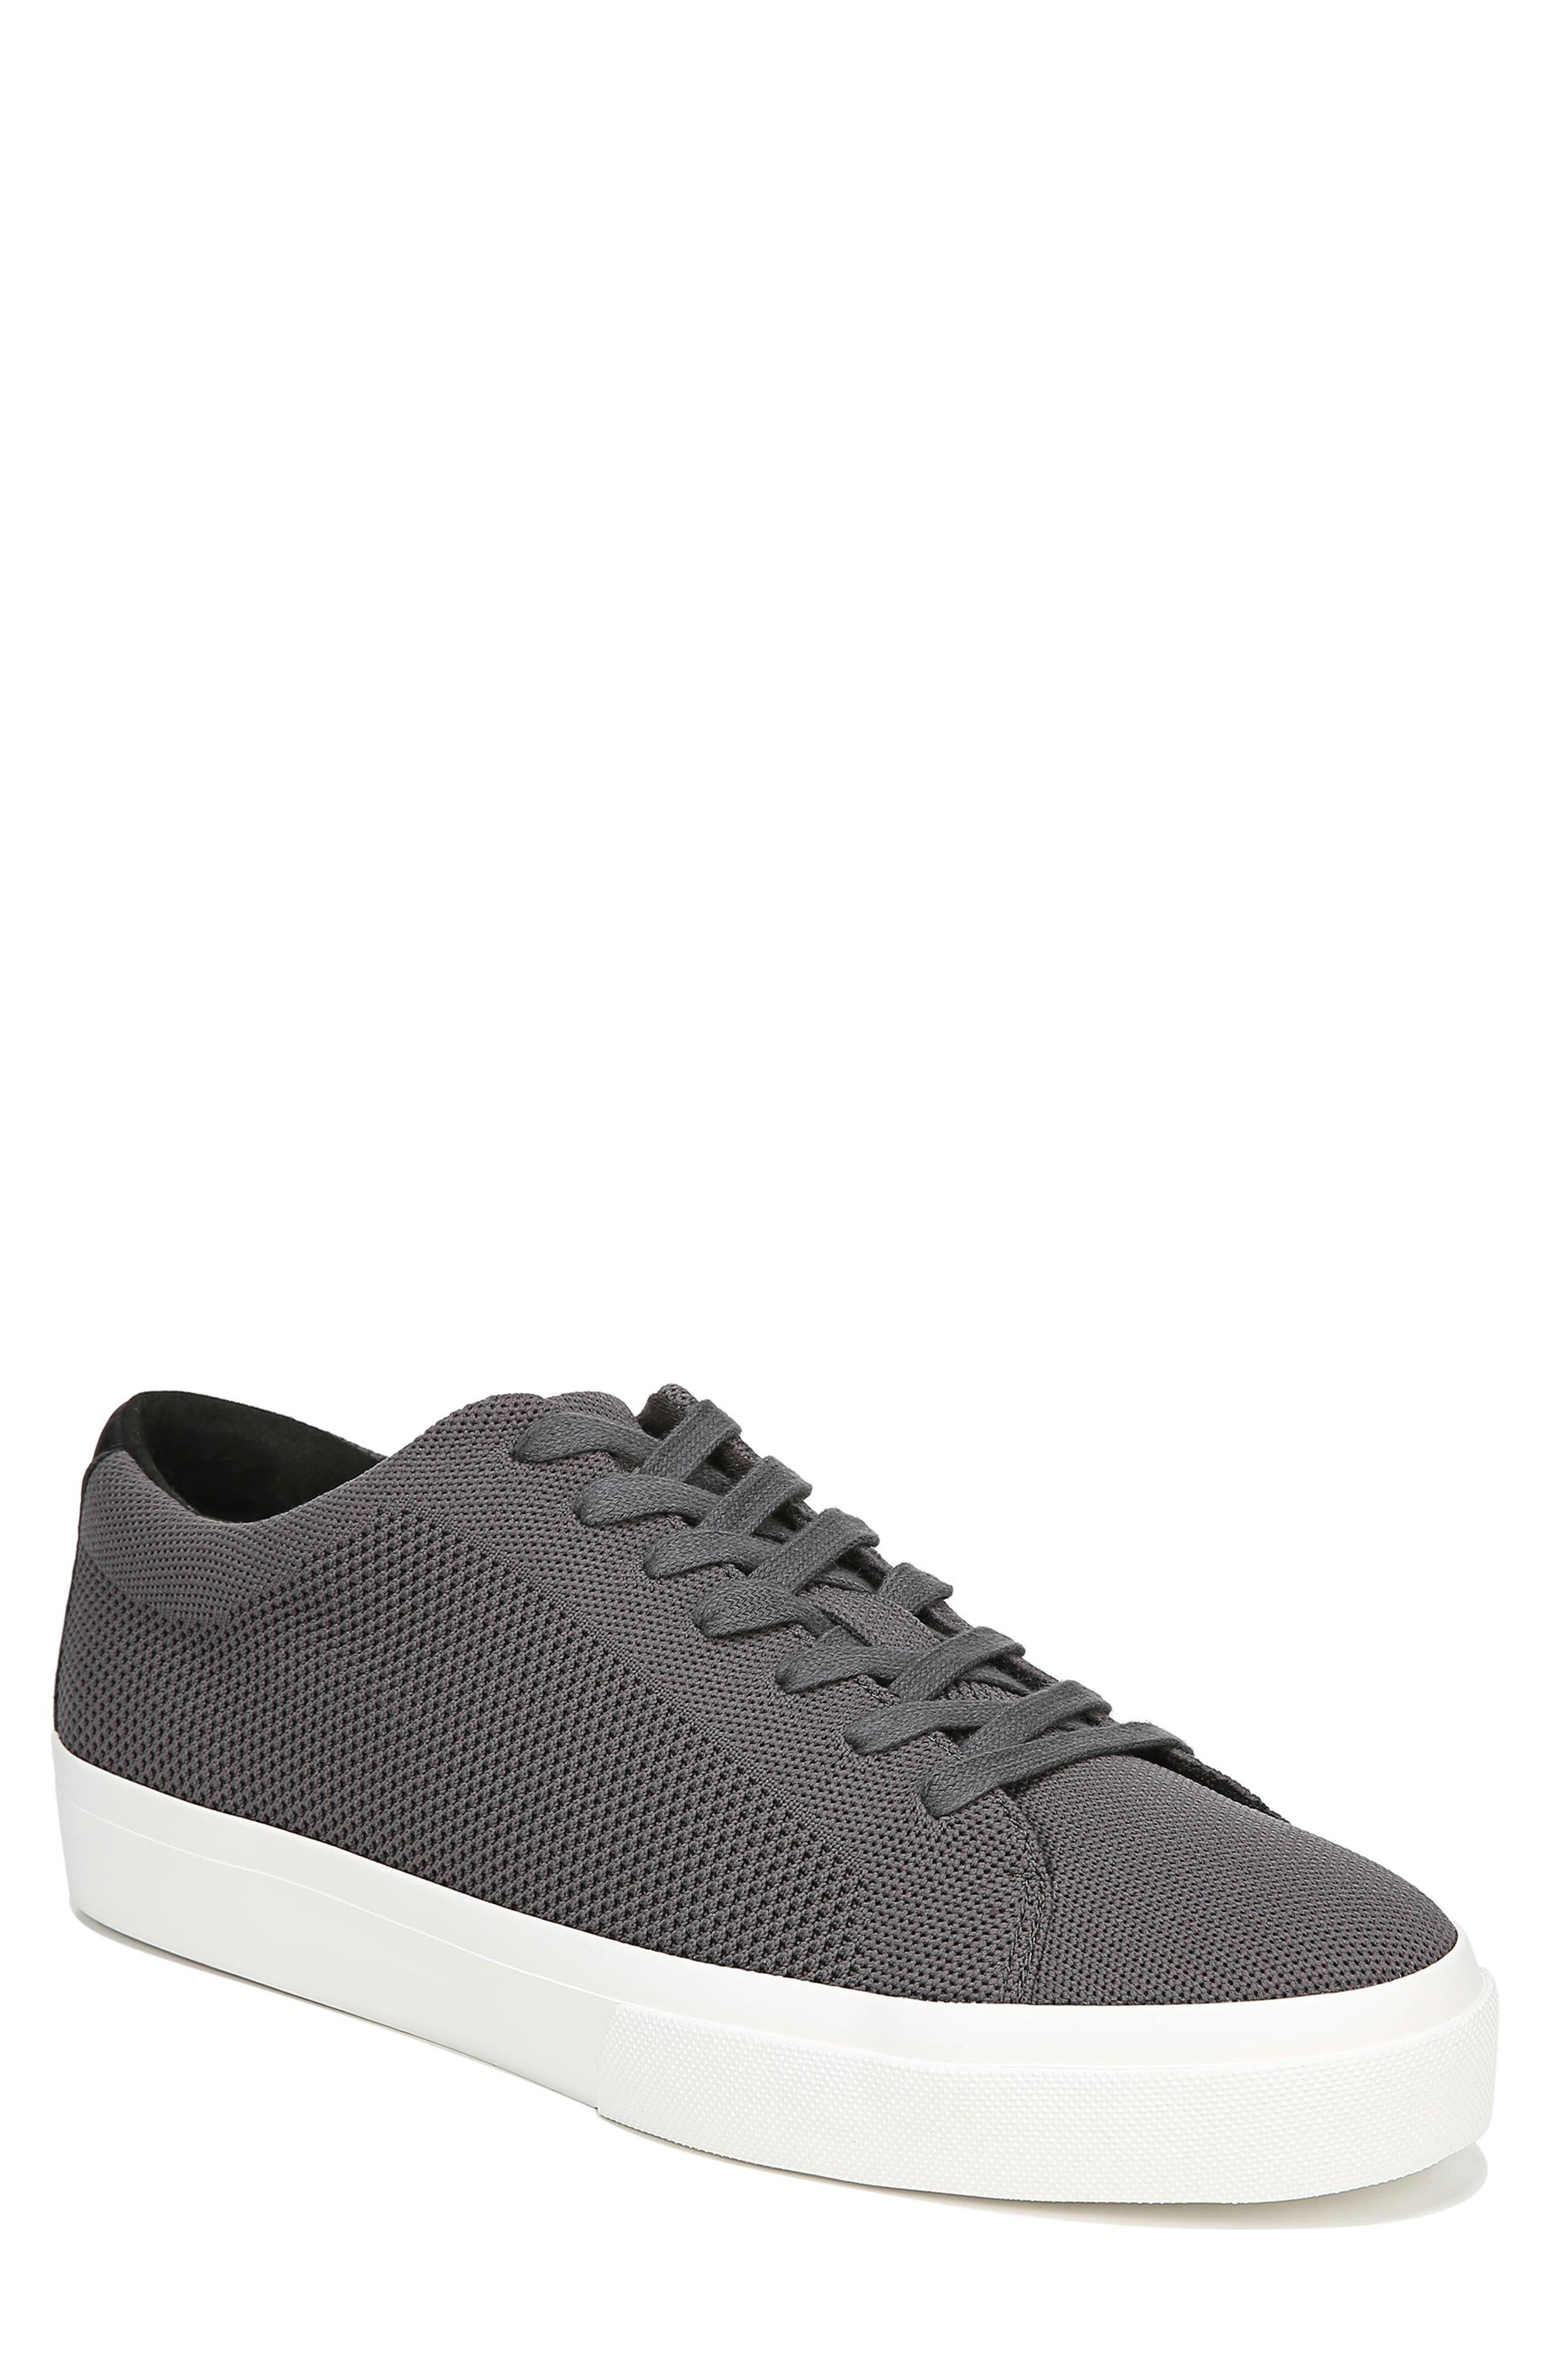 VINCE, Farrell Sneaker, Main thumbnail 1, color, GRAPHITE/ BLACK